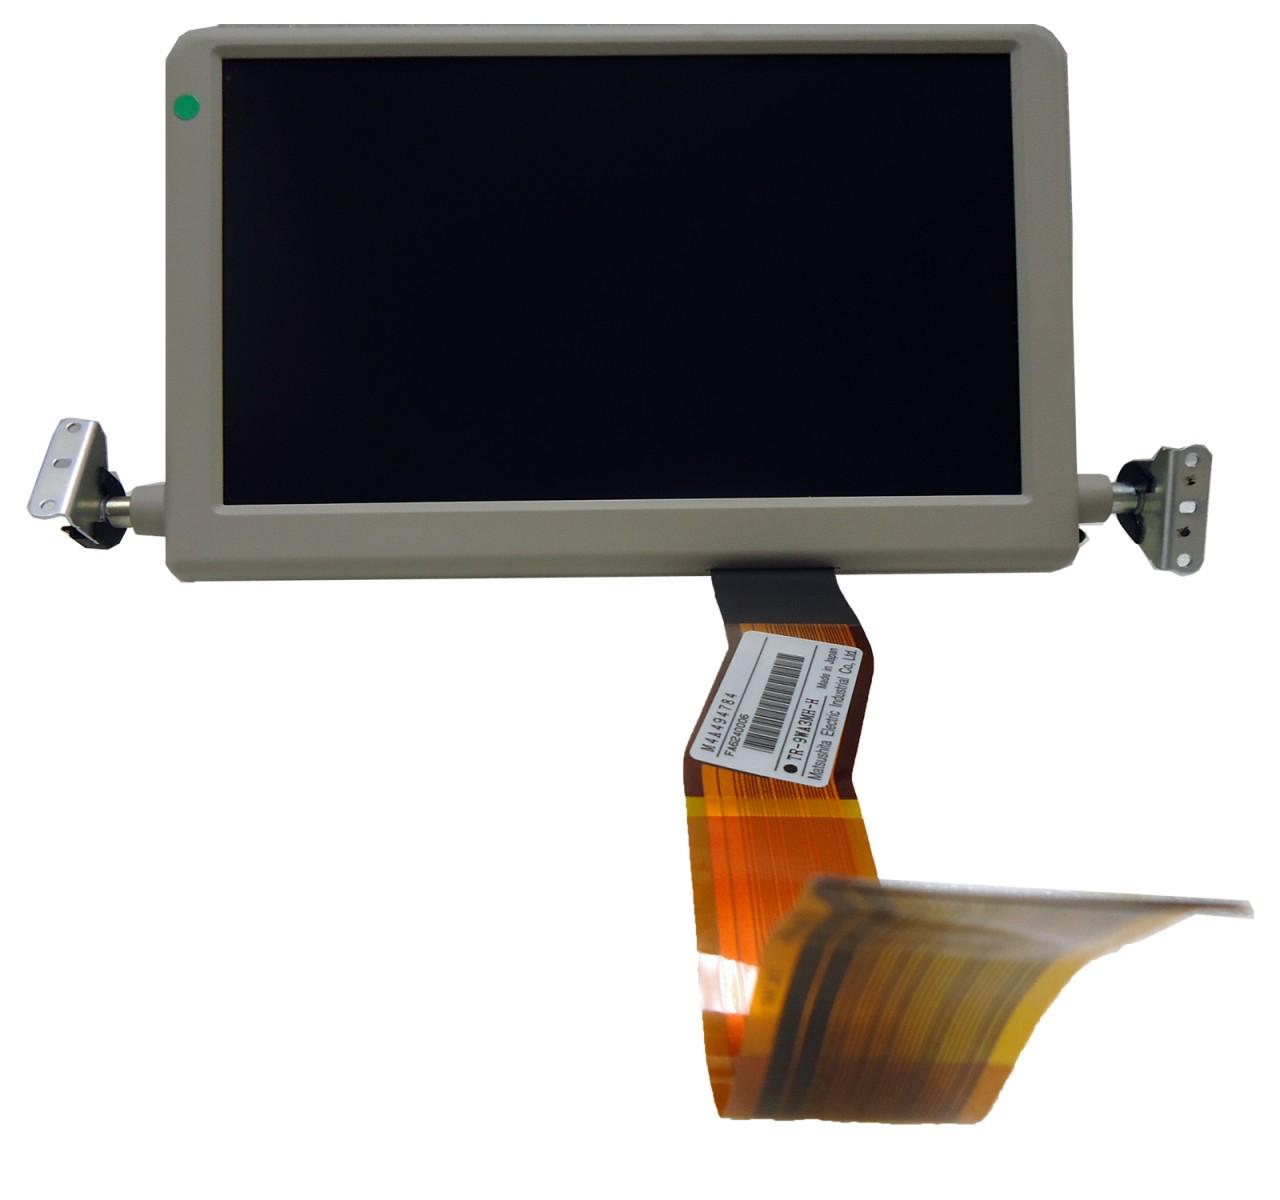 NEW 05 06 07 08 Honda ODYSSEY Acura MDX Rear DVD LCD SCREEN Display Grey Gray | eBay